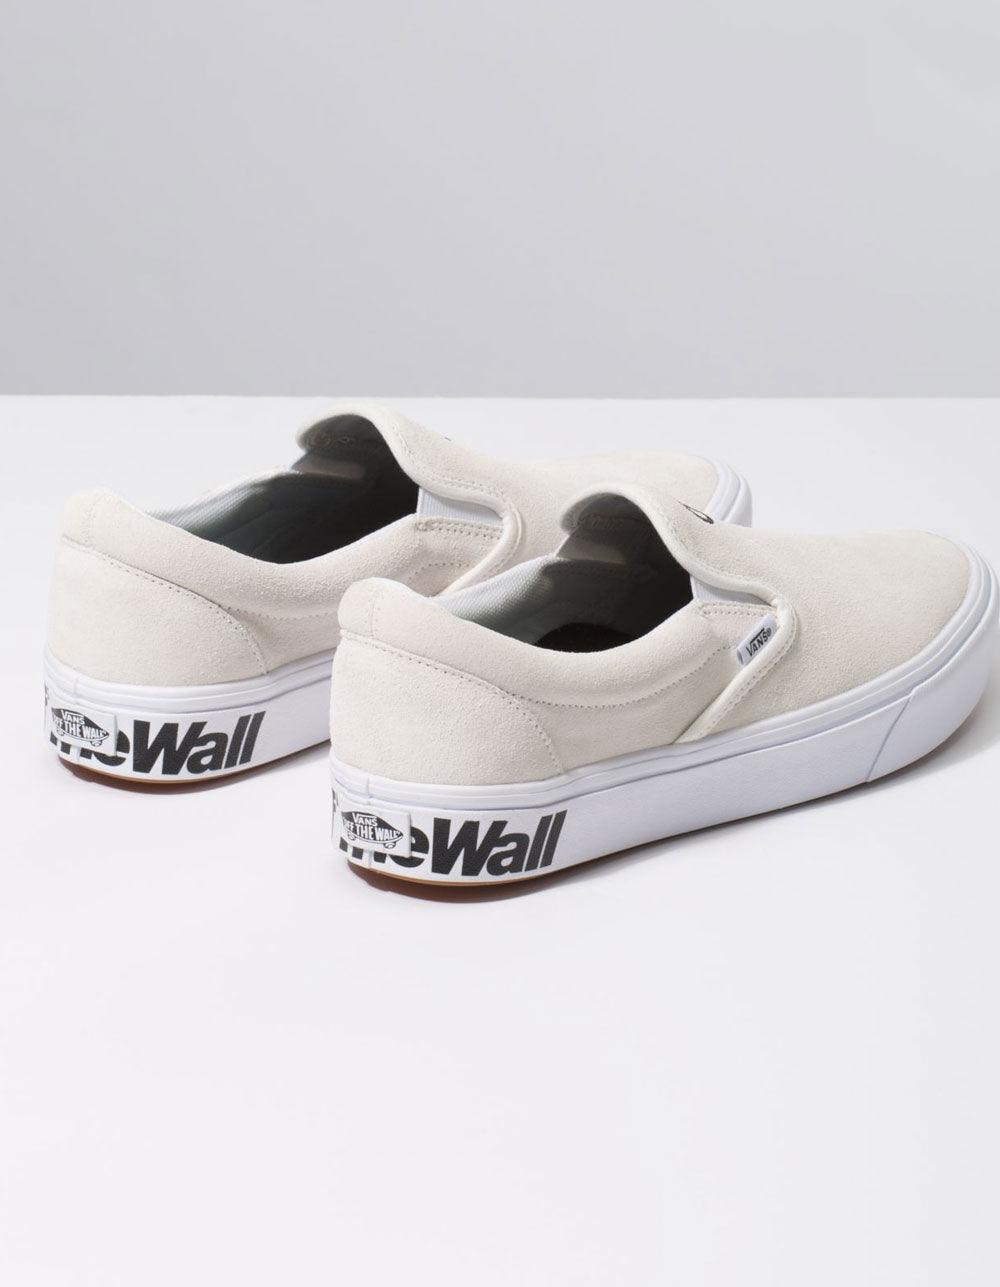 Comfycush Distort Slip-on Blanc & Black Shoes